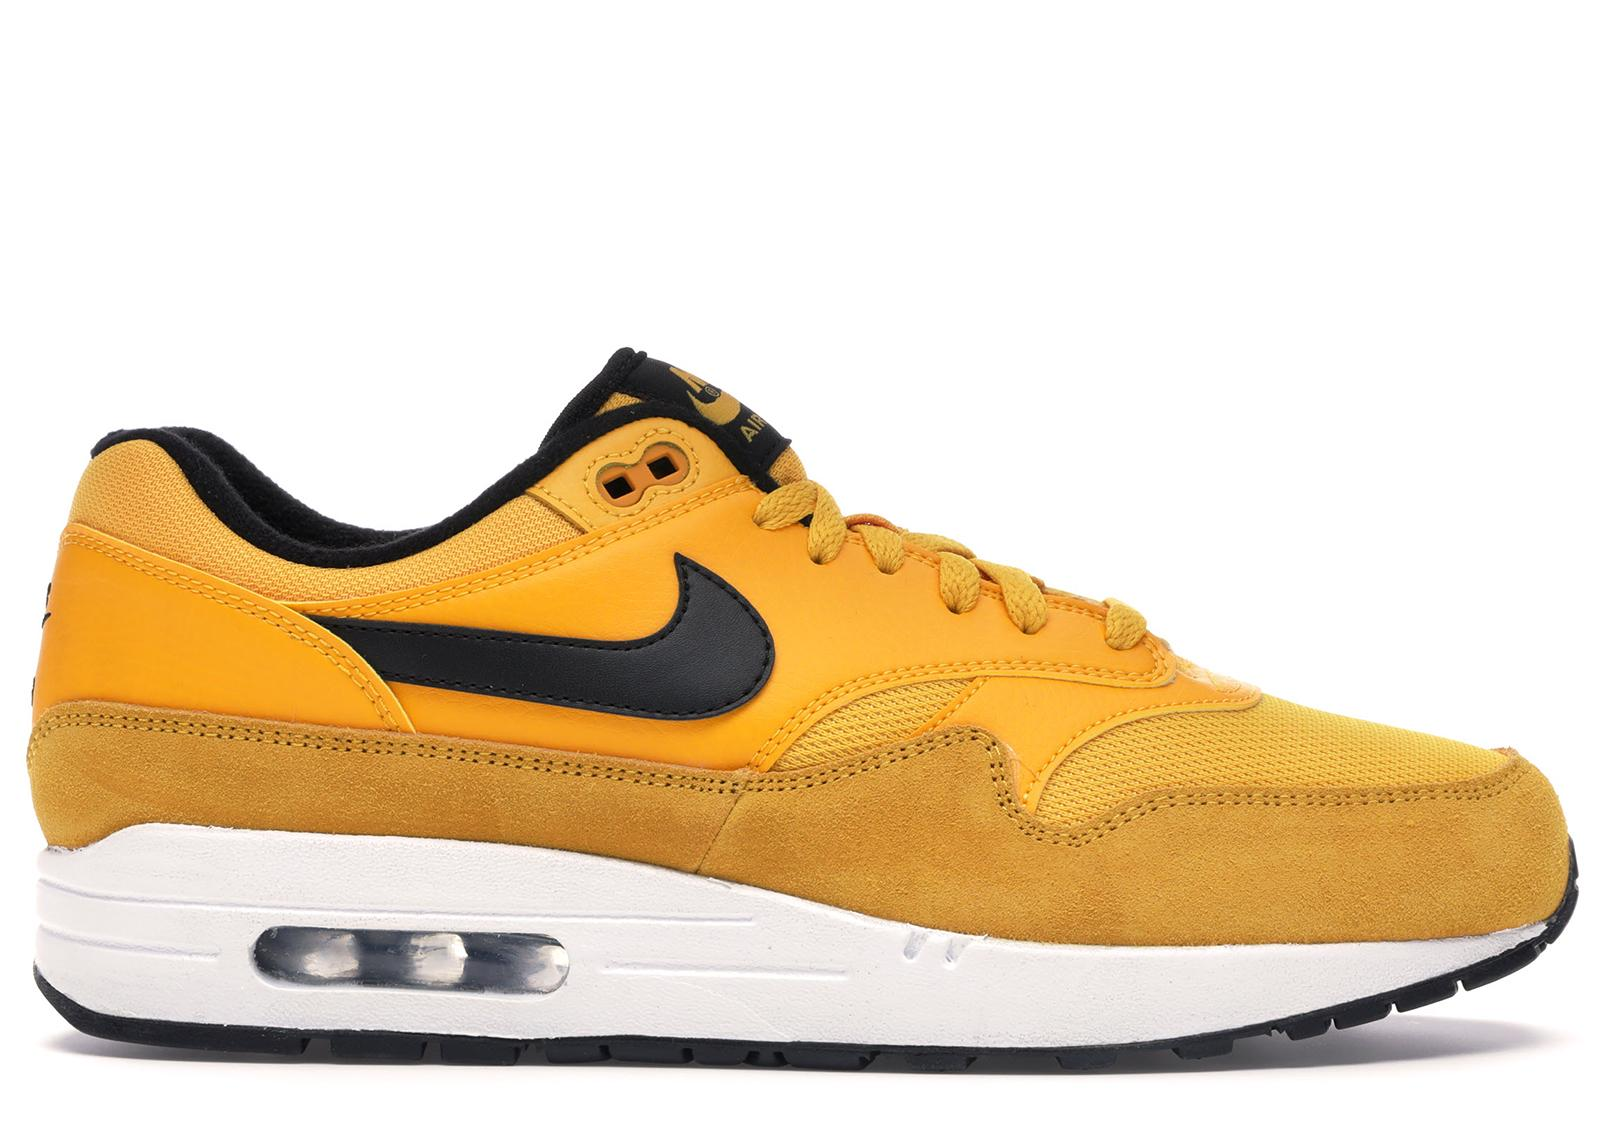 Nike Air Max 1 University Gold in